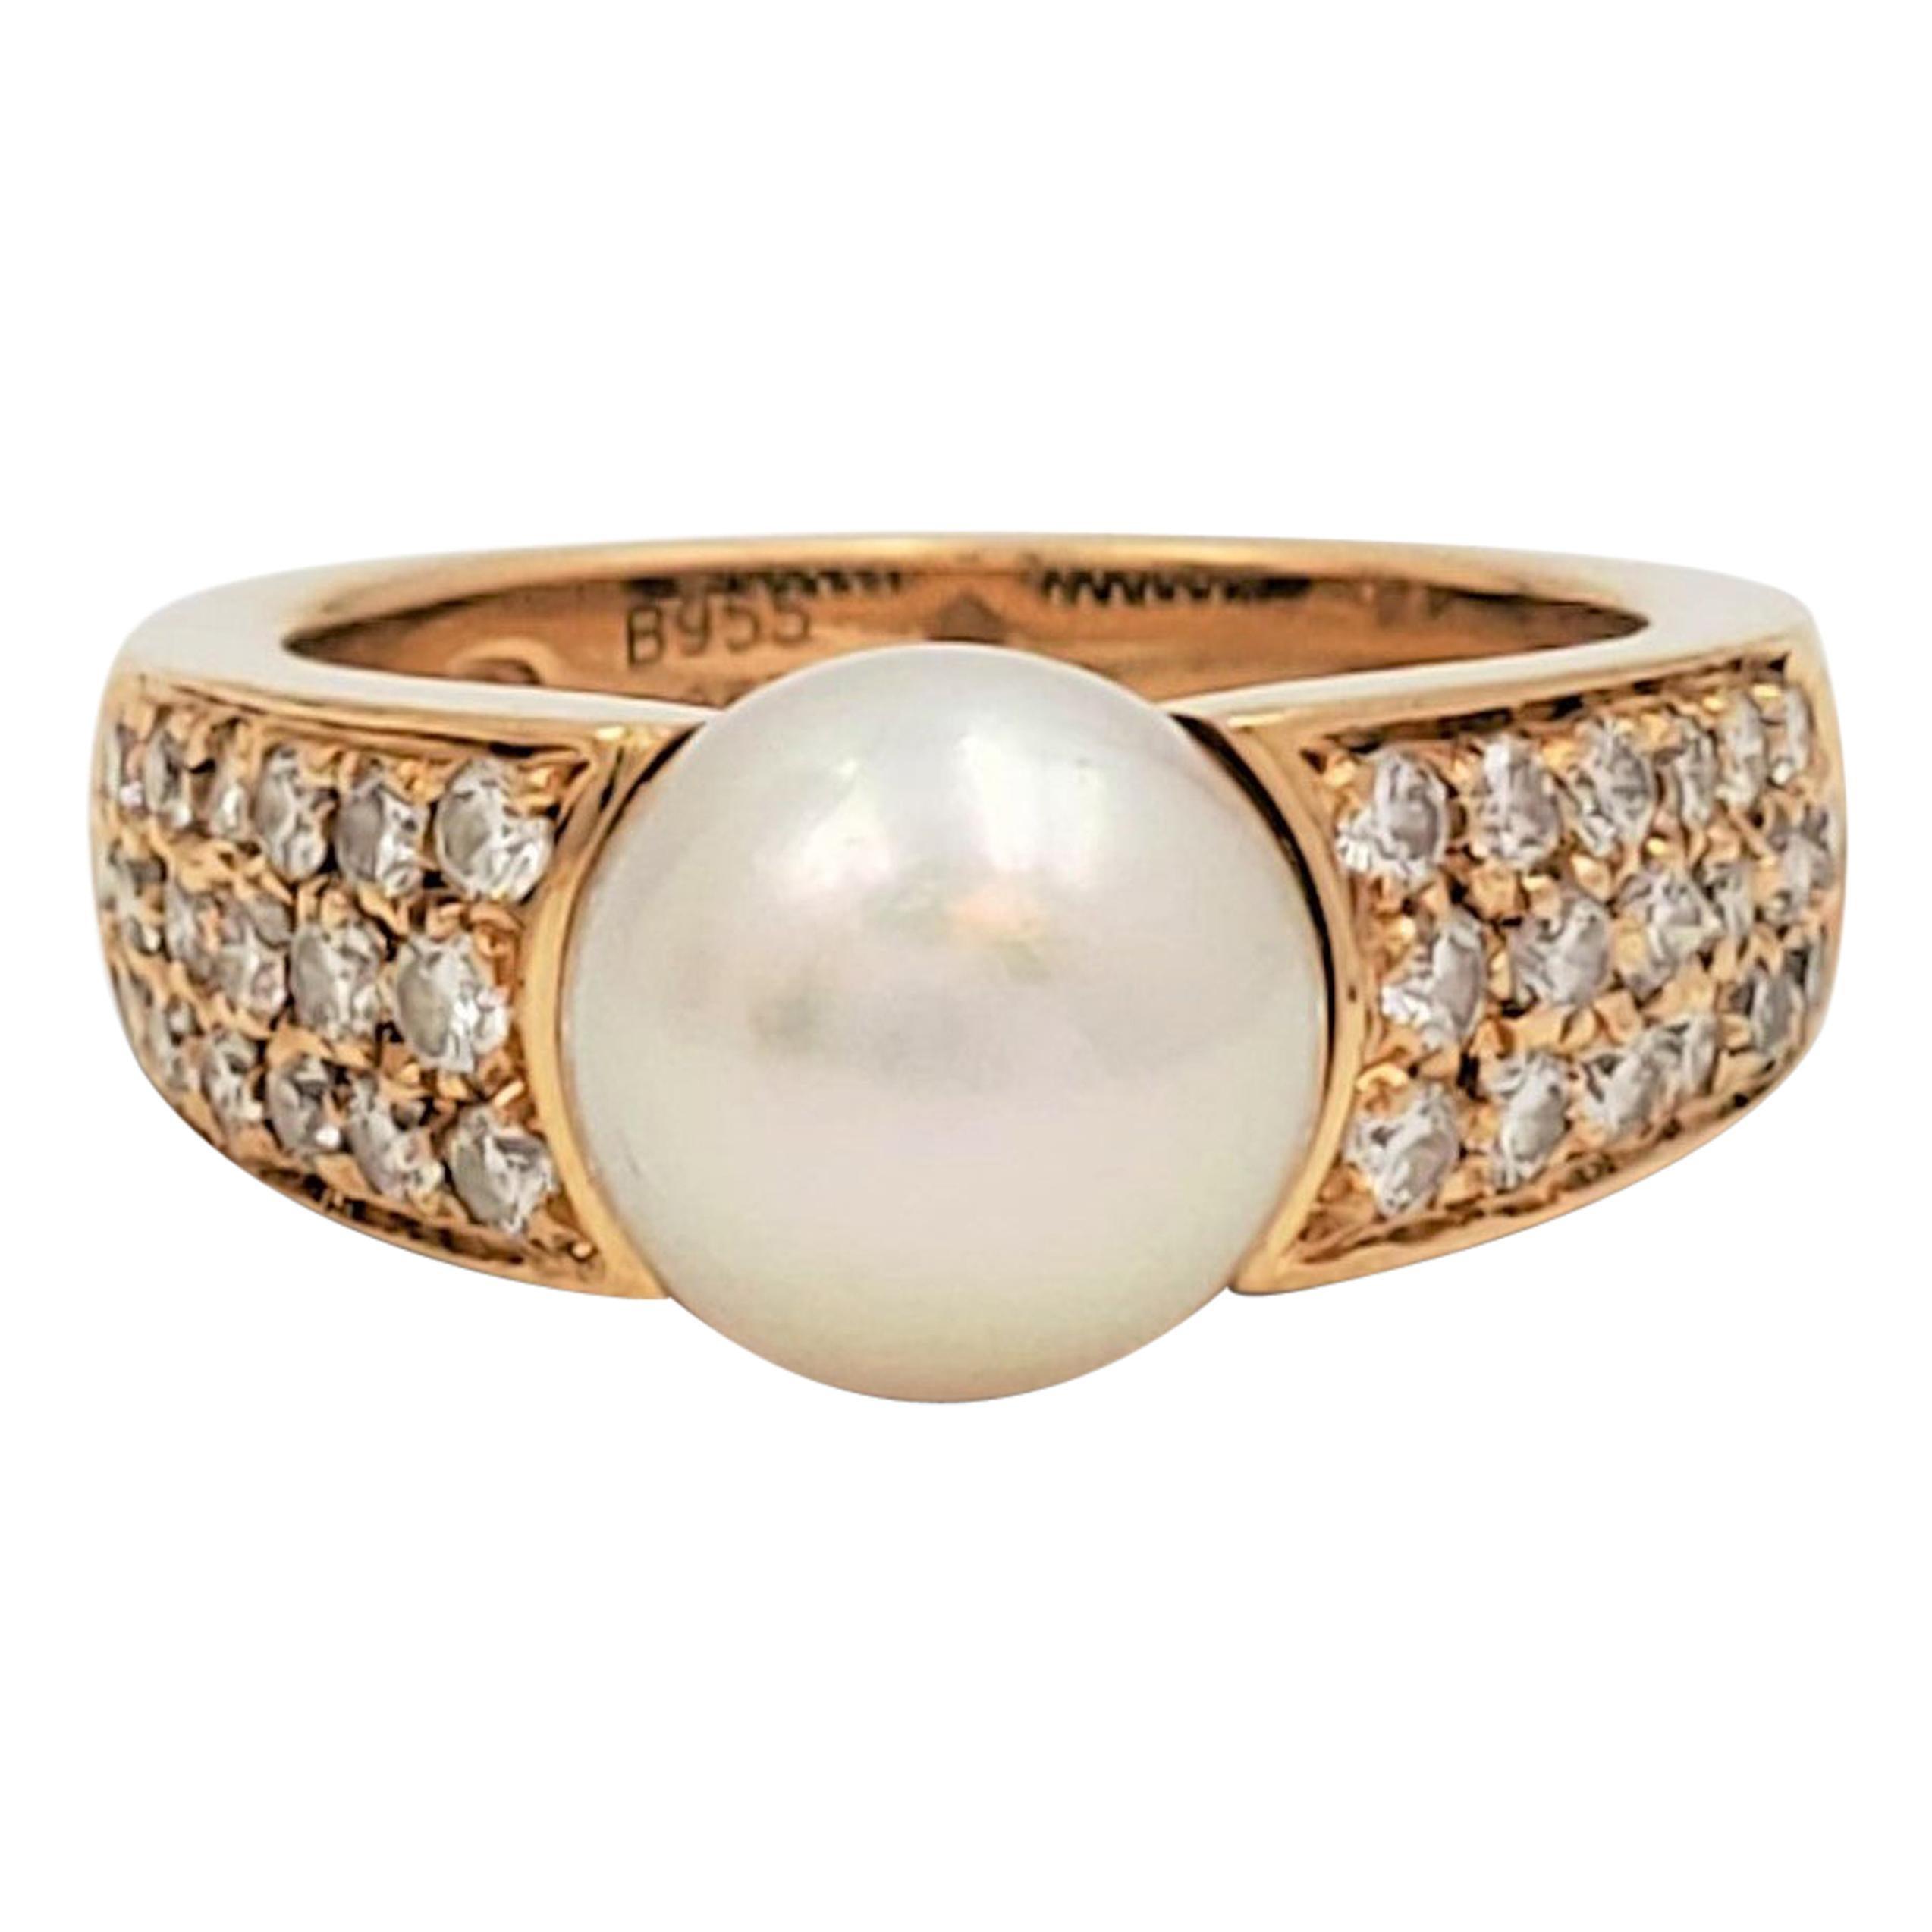 Vintage Boucheron Gold Pearl and Diamond Ring